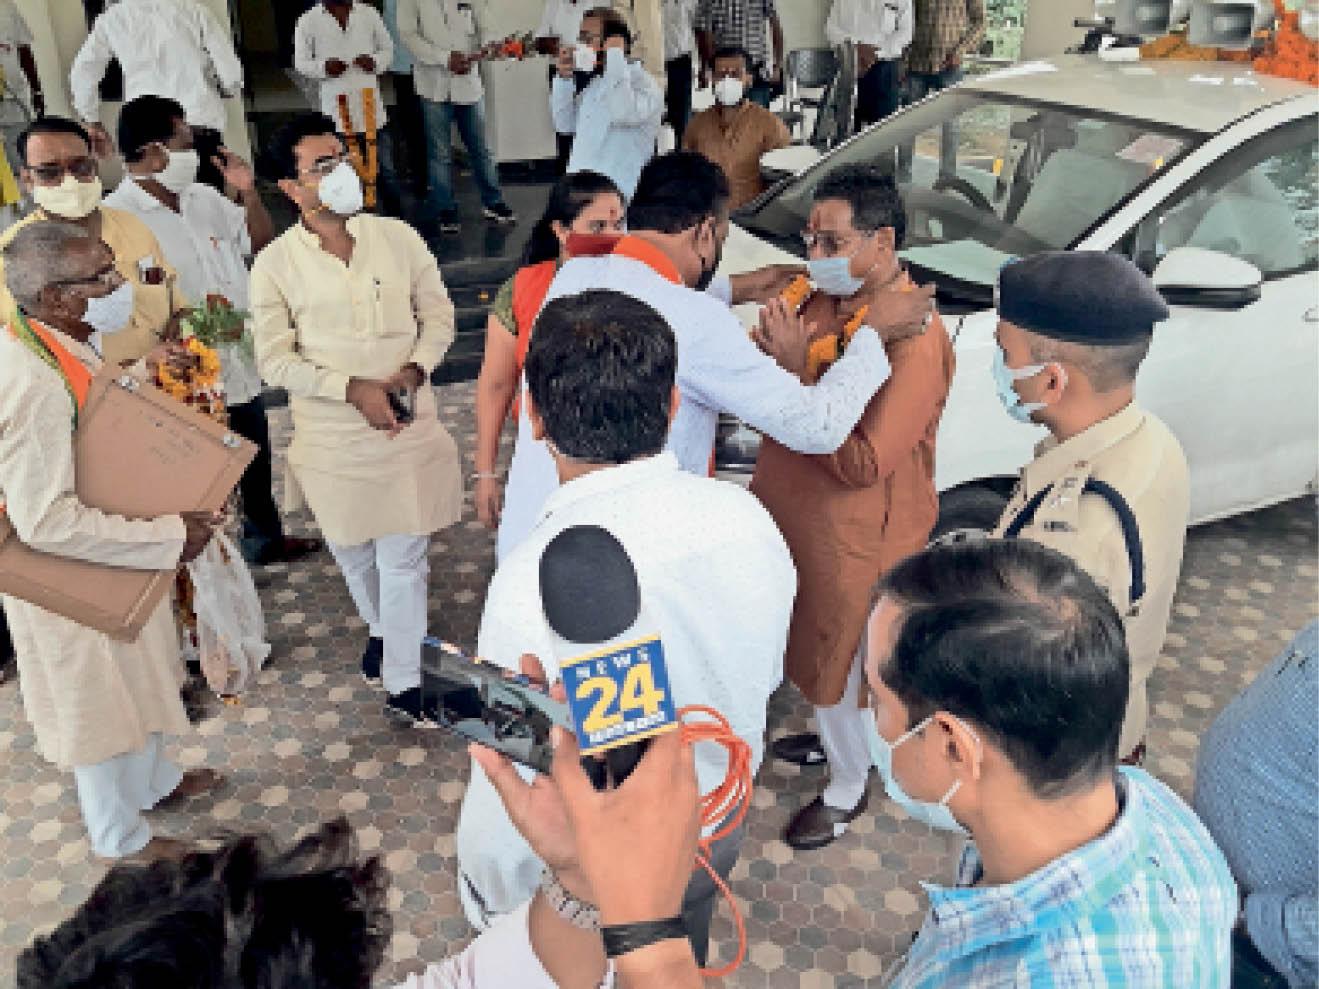 हाईवे पर हिचकोले खाती कार से रेस्ट हाउस पहुंचते ही प्रभारी मंत्री प्रेमसिंह पटेल ने राहत की सांस ली। - Dainik Bhaskar